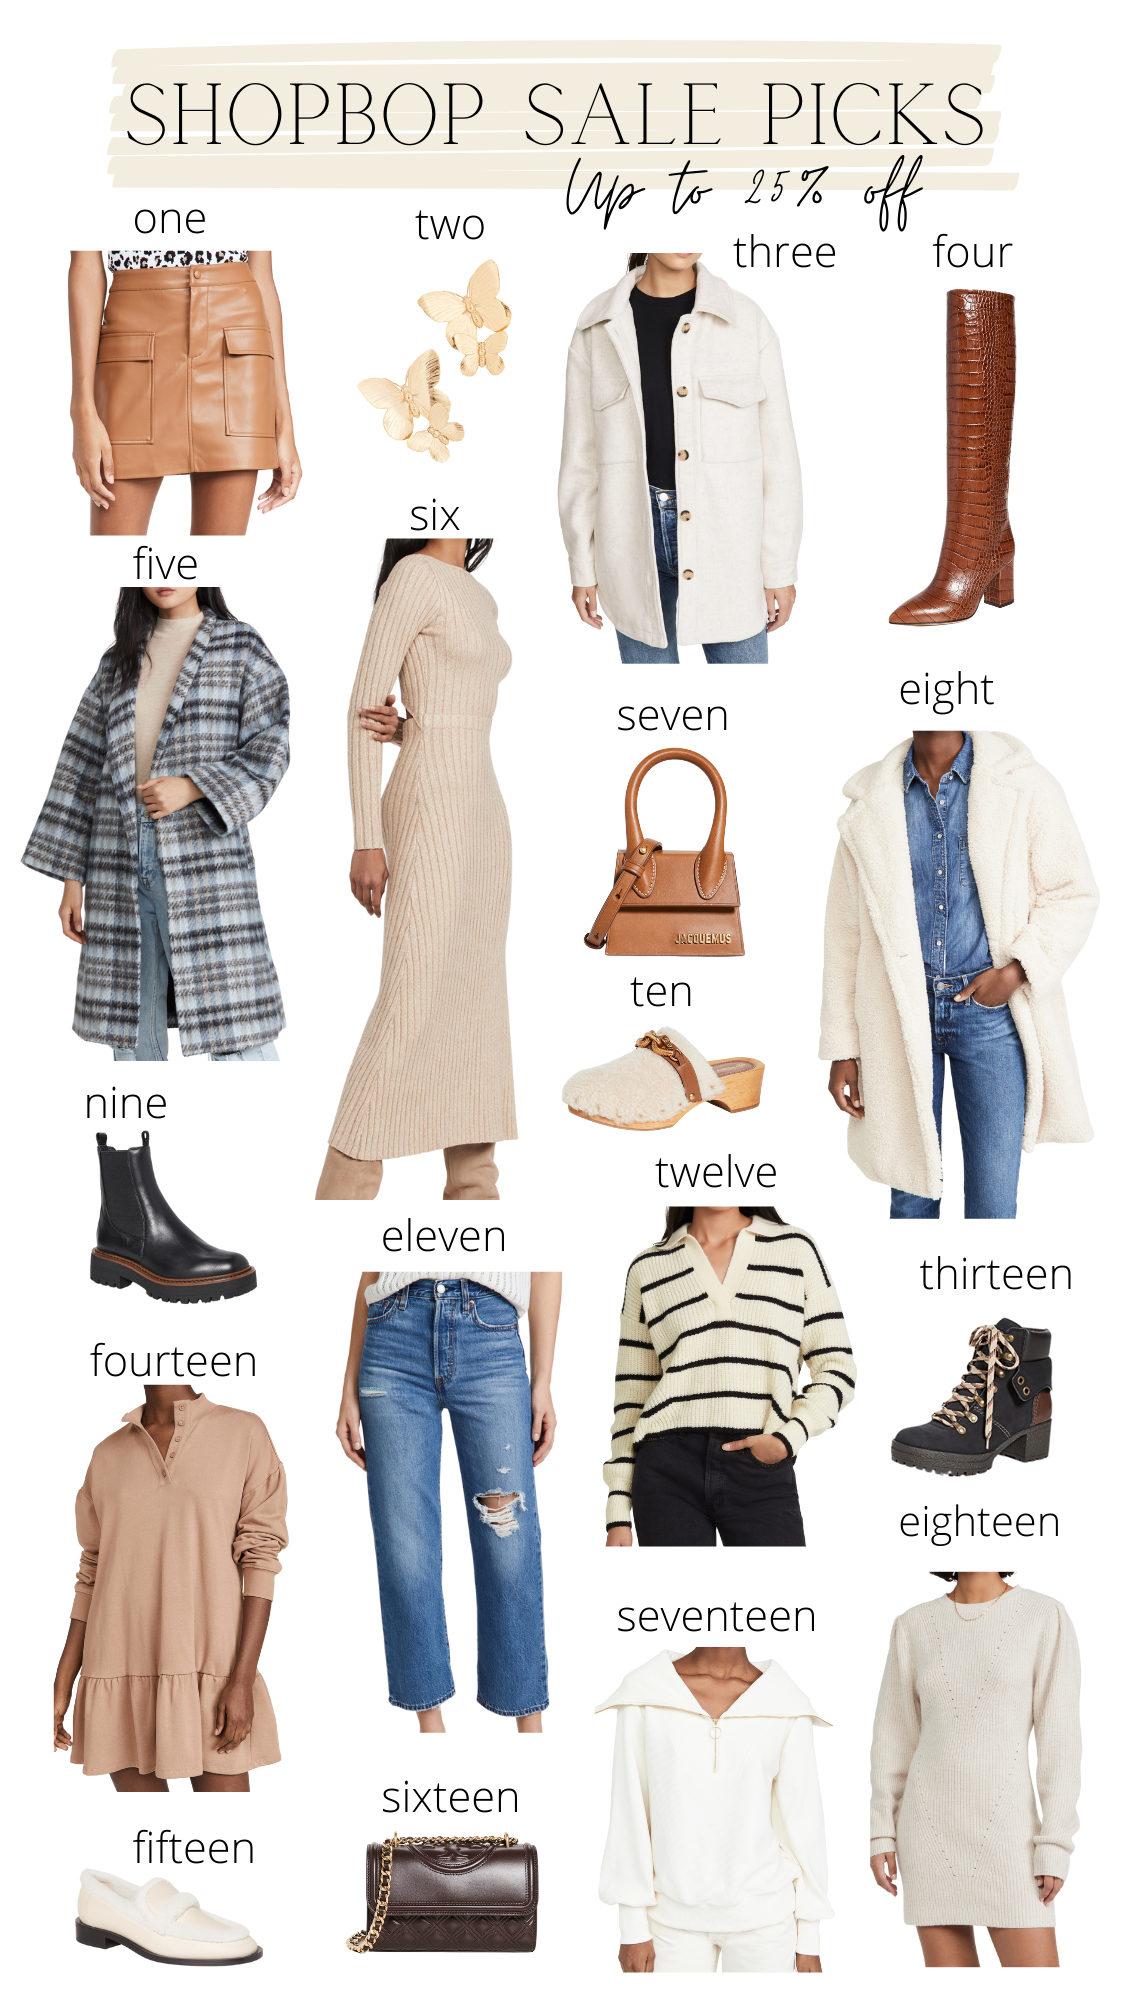 shopbop sale finds, shopbop sale, fall finds, fall sale, shopbop style event